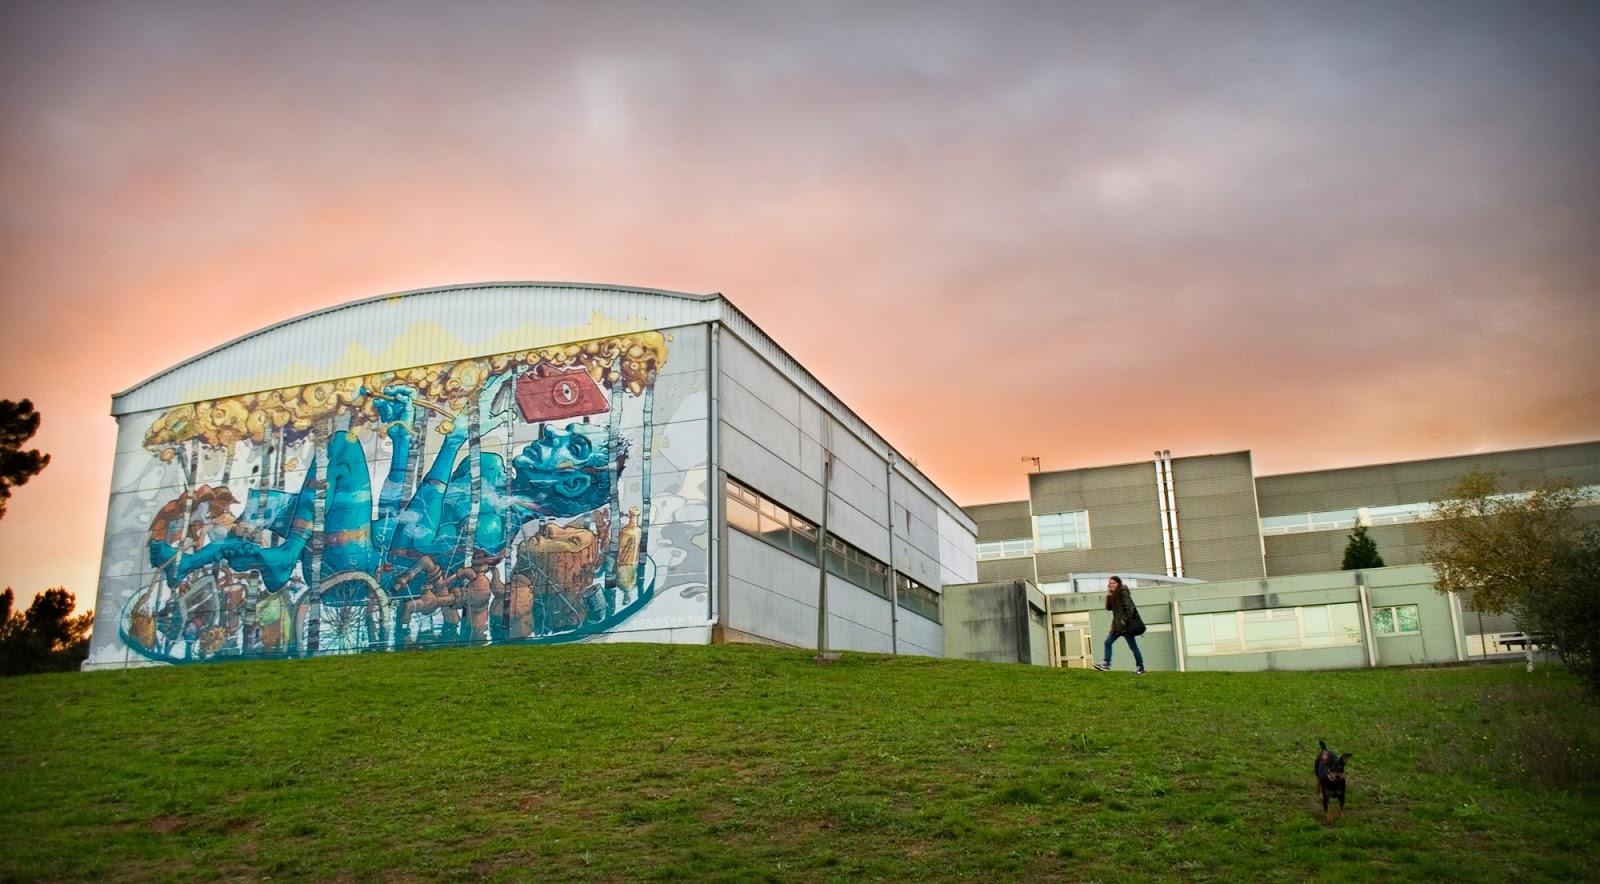 nomada-new-mural-at-desordes-creativas-2013-01